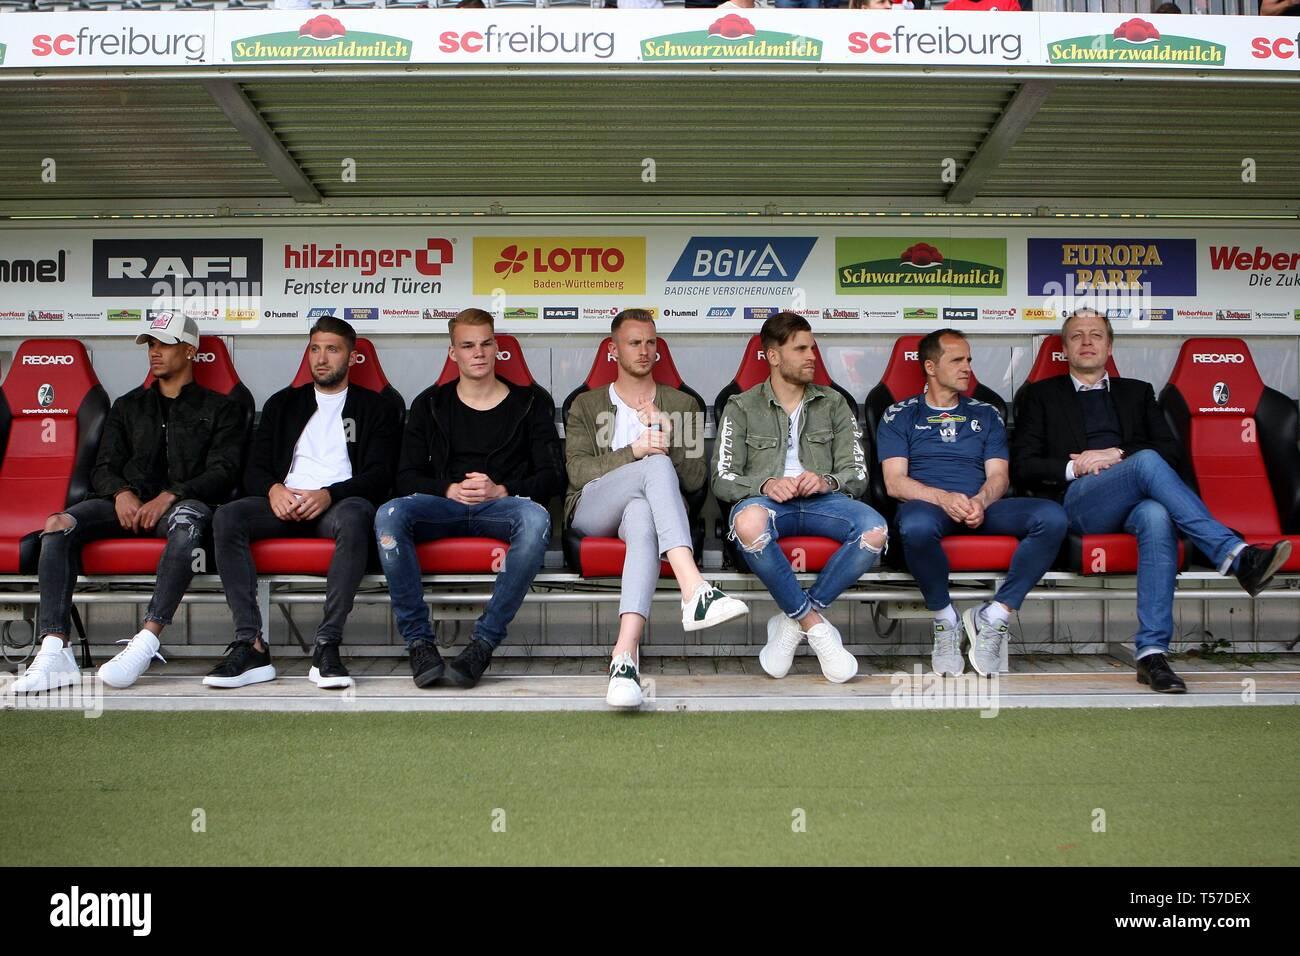 firo: 21.04.2019, football, 1.Bundesliga, season 2018/2019, SC Freiburg - Borussia Dortmund, injured players before the game on the bench,   usage worldwide - Stock Image